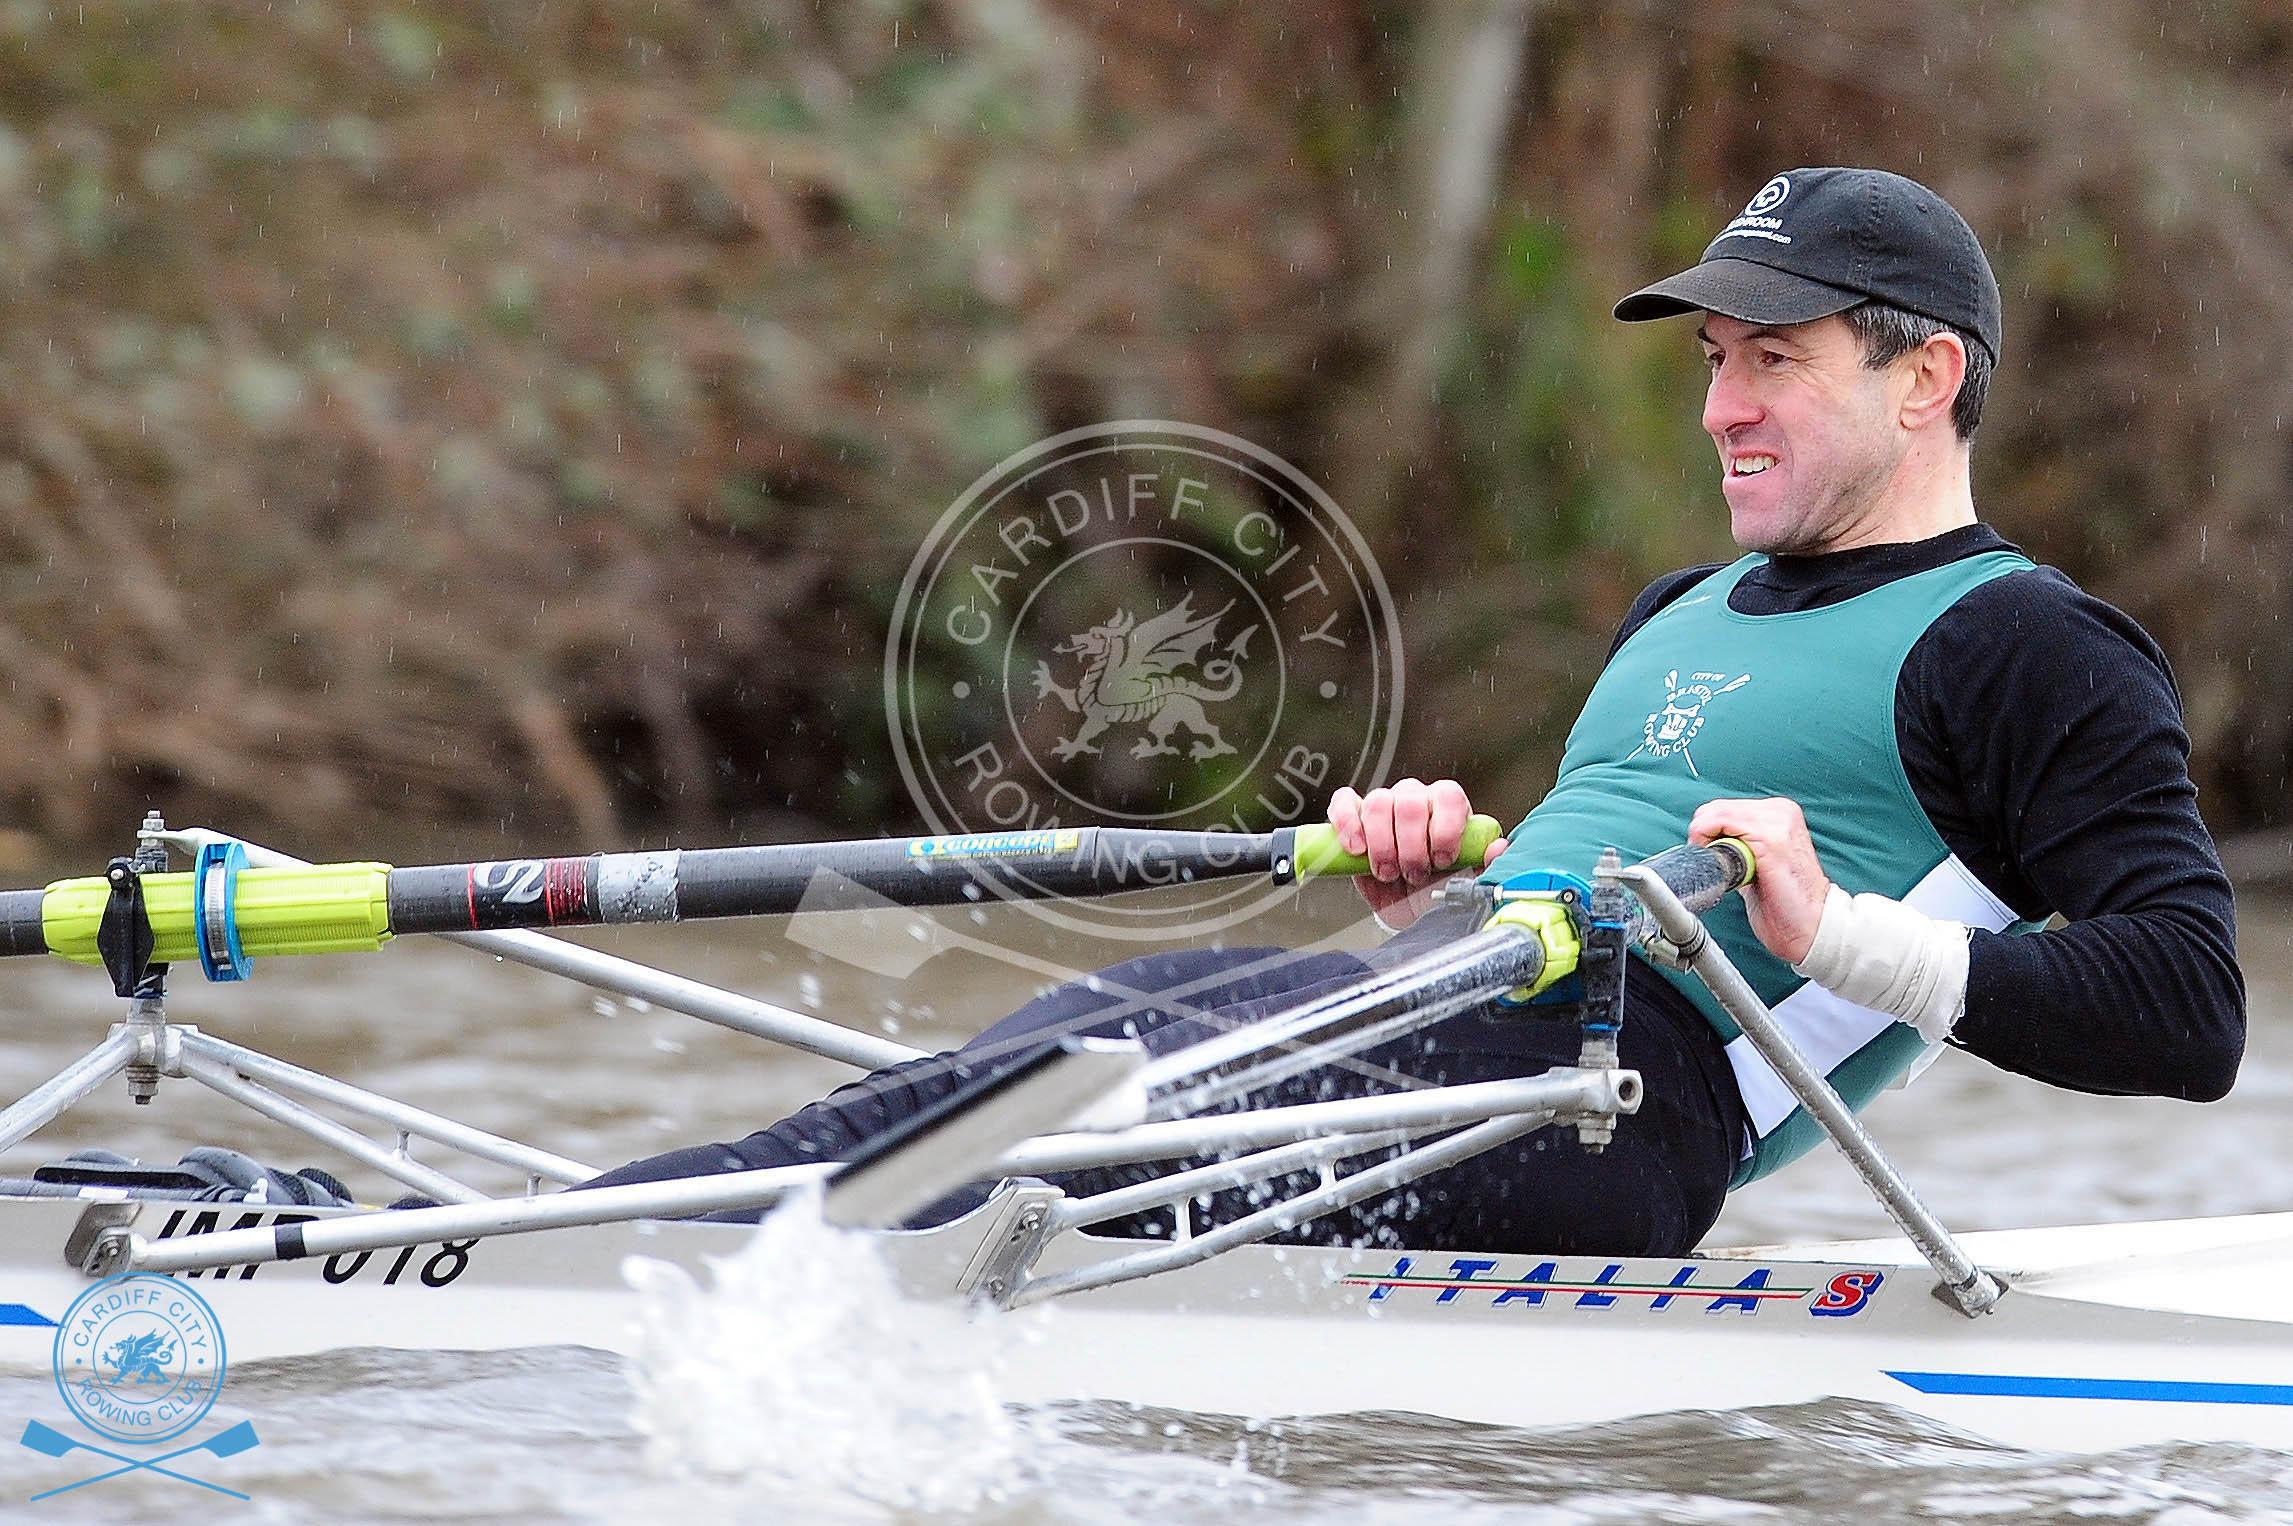 DW_280119_Cardiff_City_Rowing_290.jpg